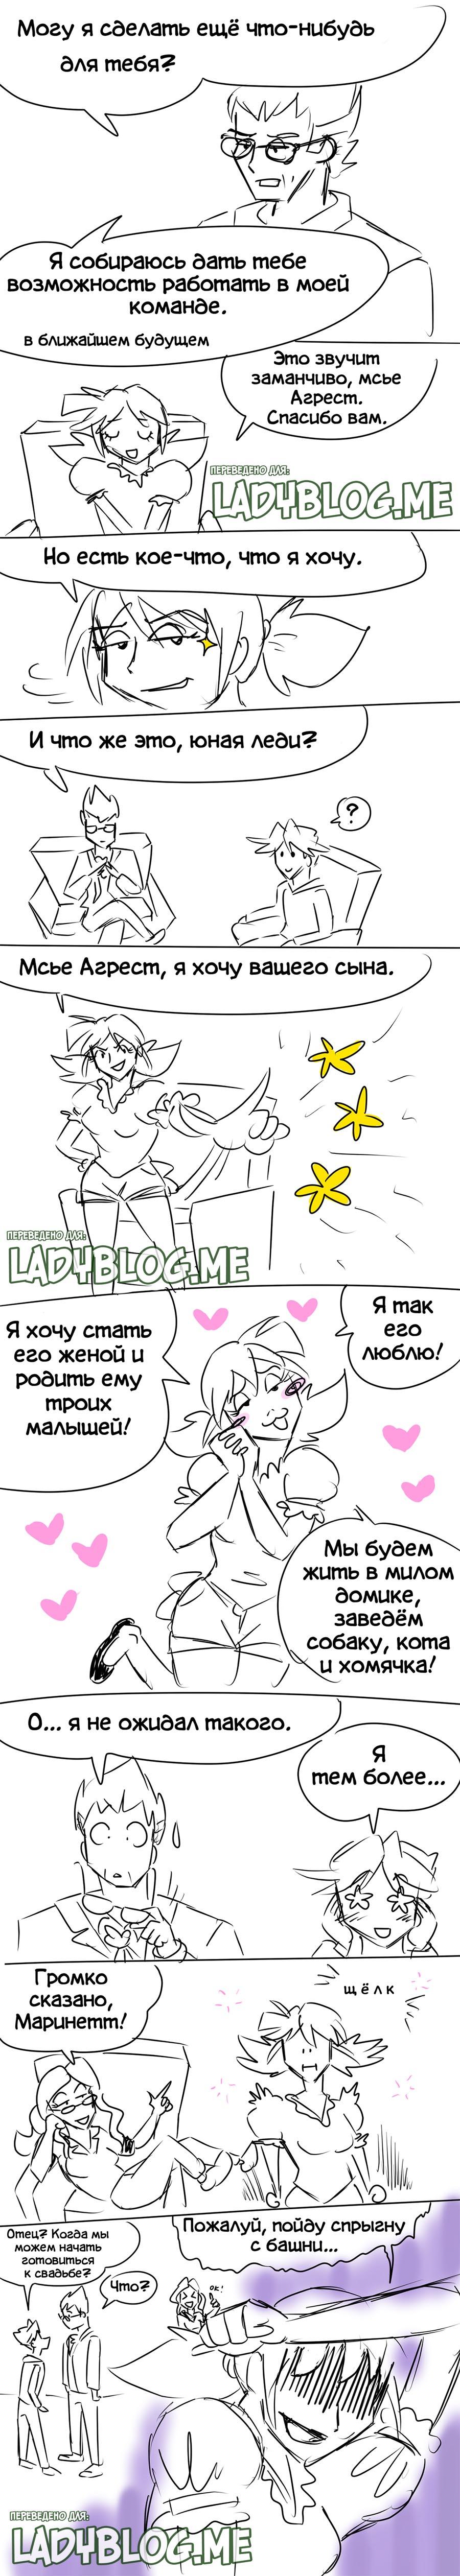 Комикс Леди Баг Мсье Агрест 1